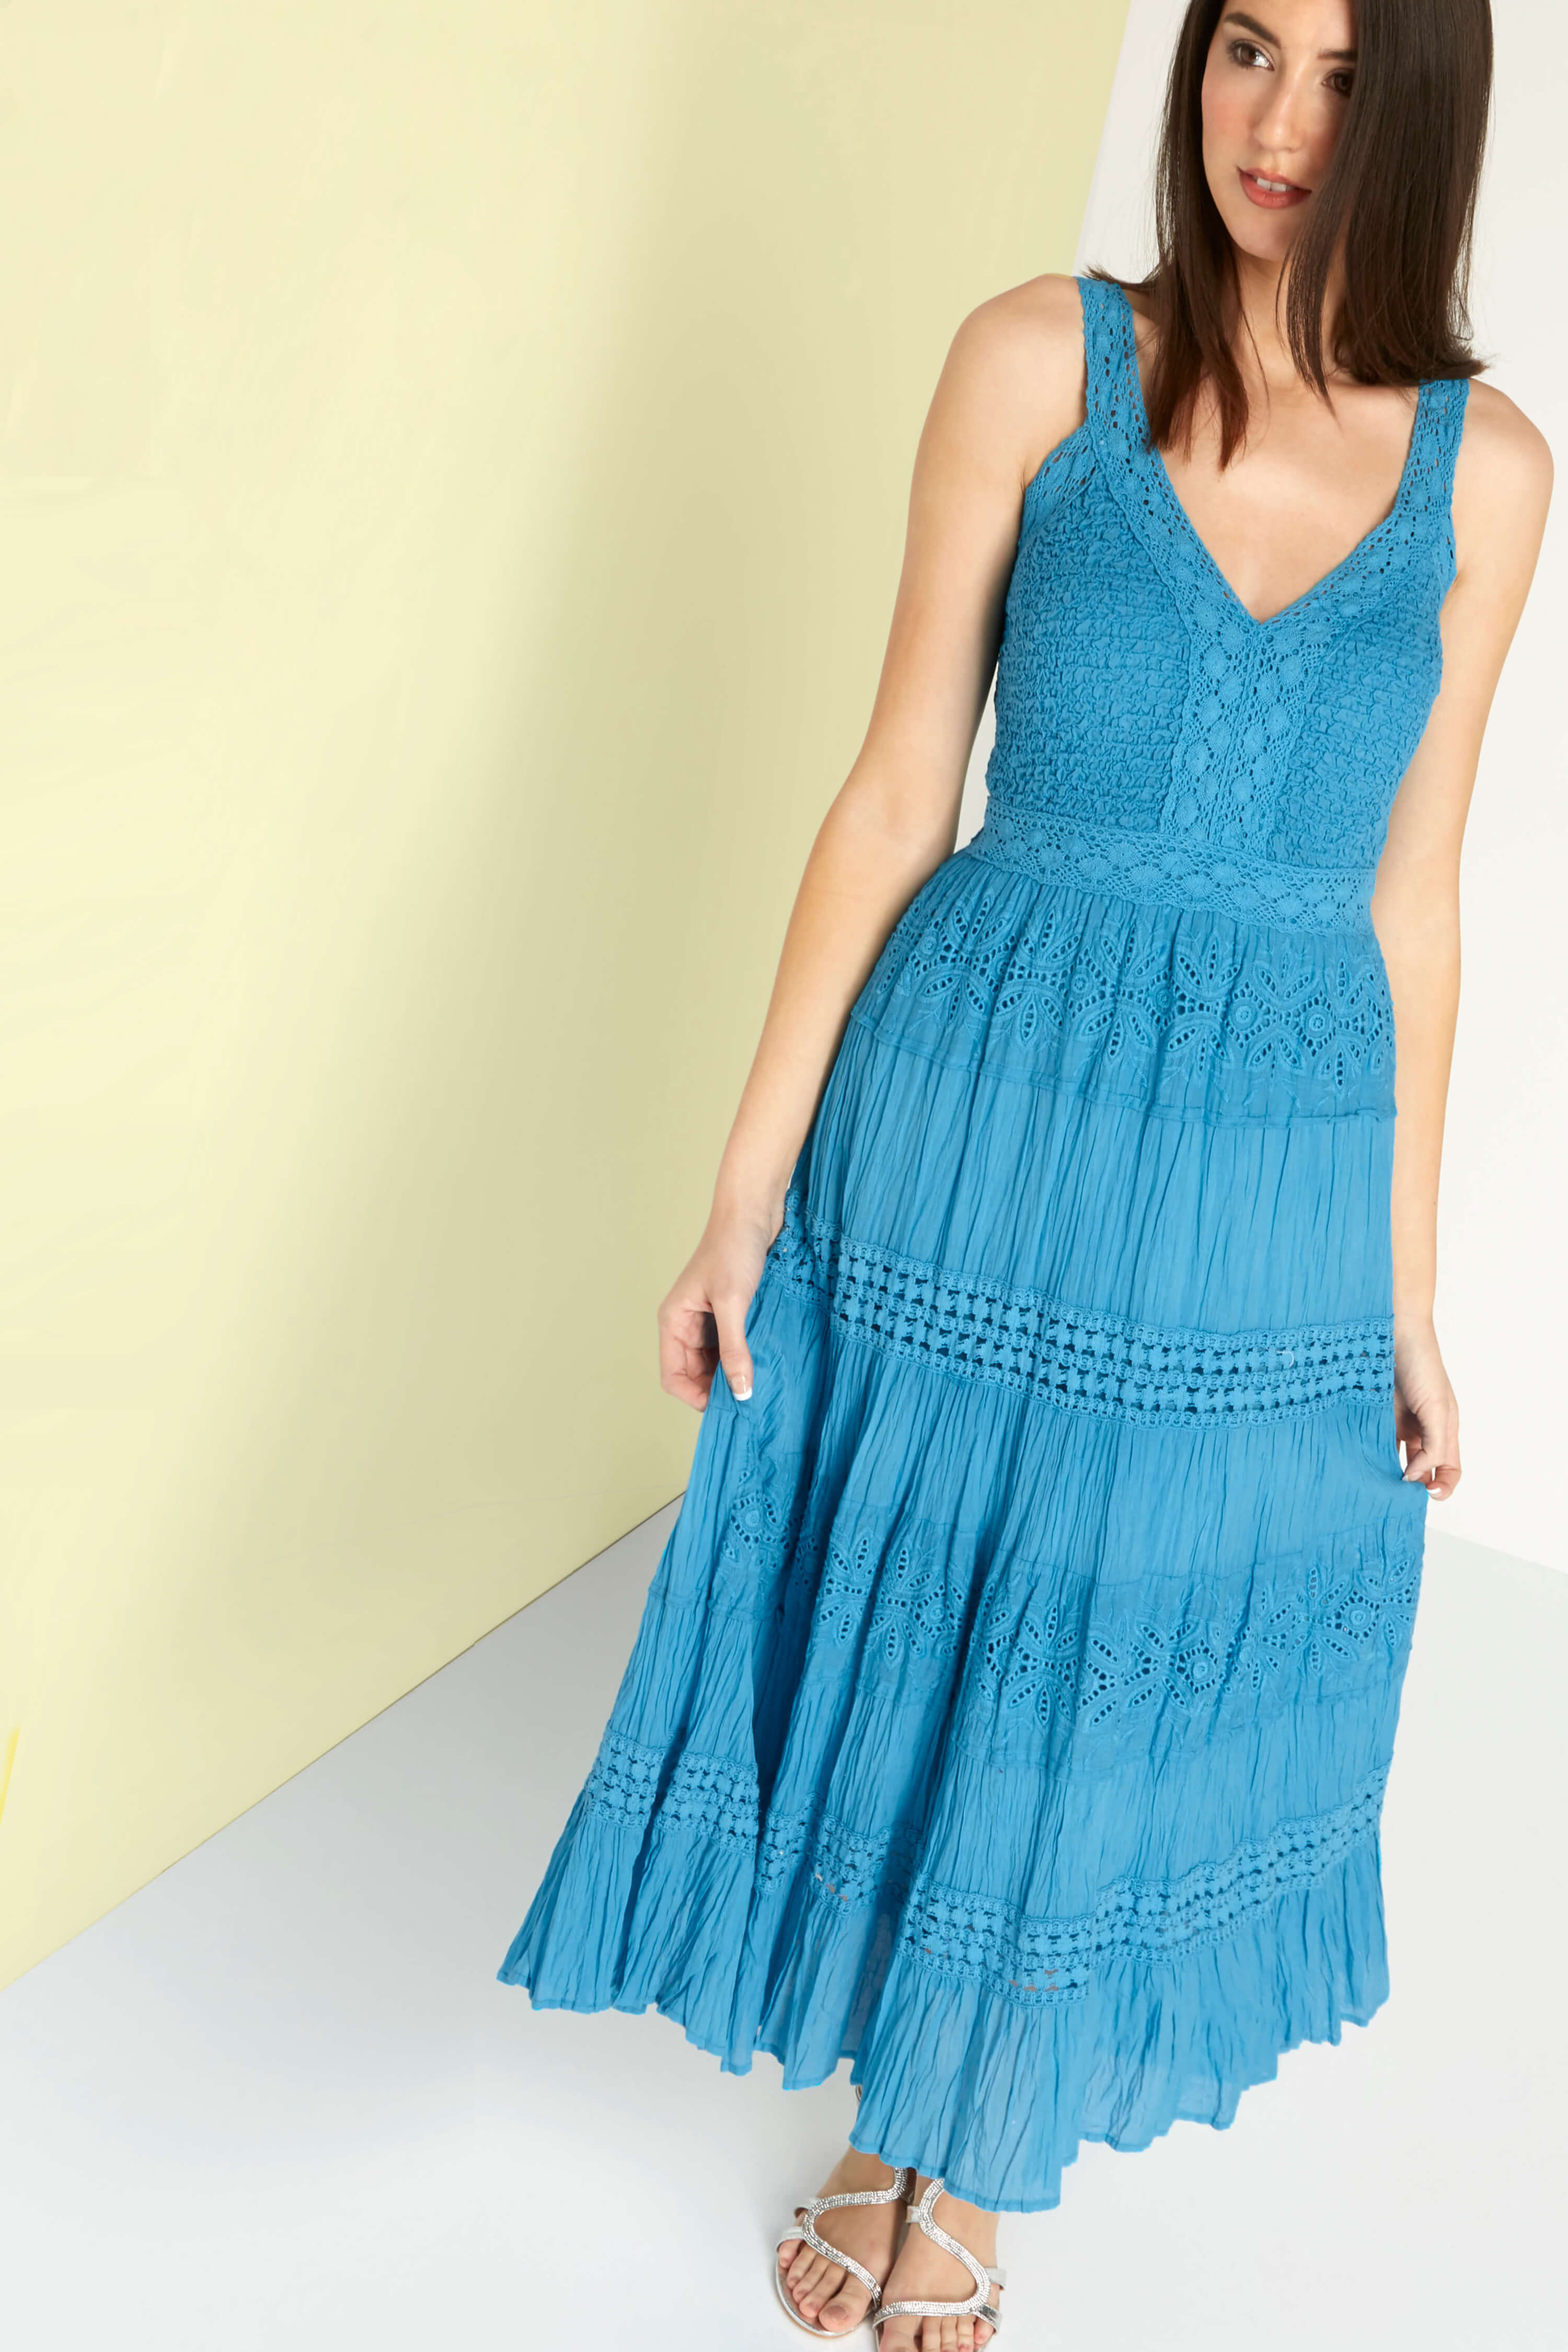 Roman Originals 100% Cotton Summer Maxi Dress in Blue